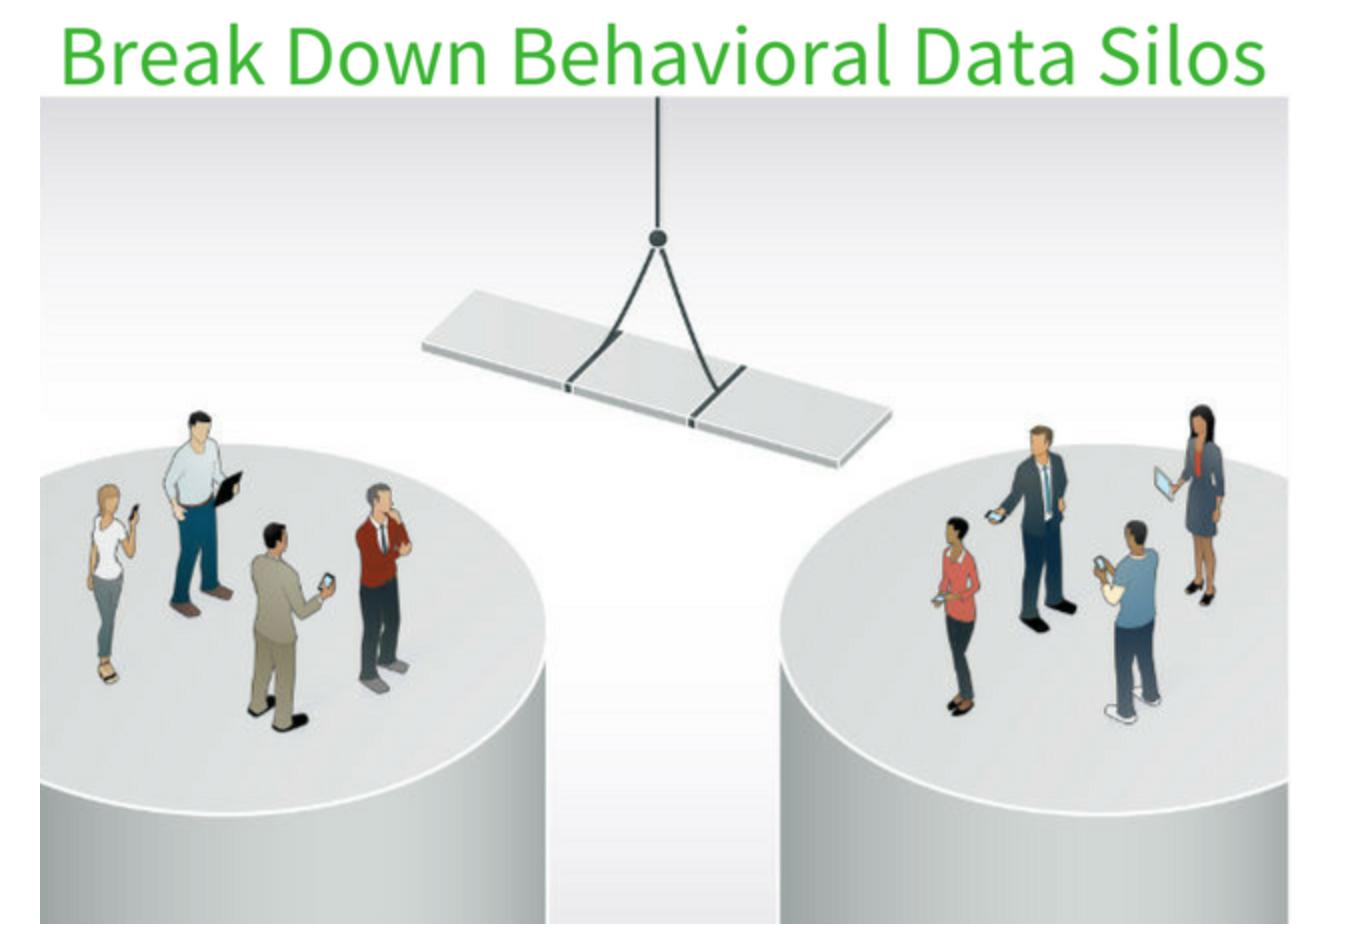 Behavioral Data Silos